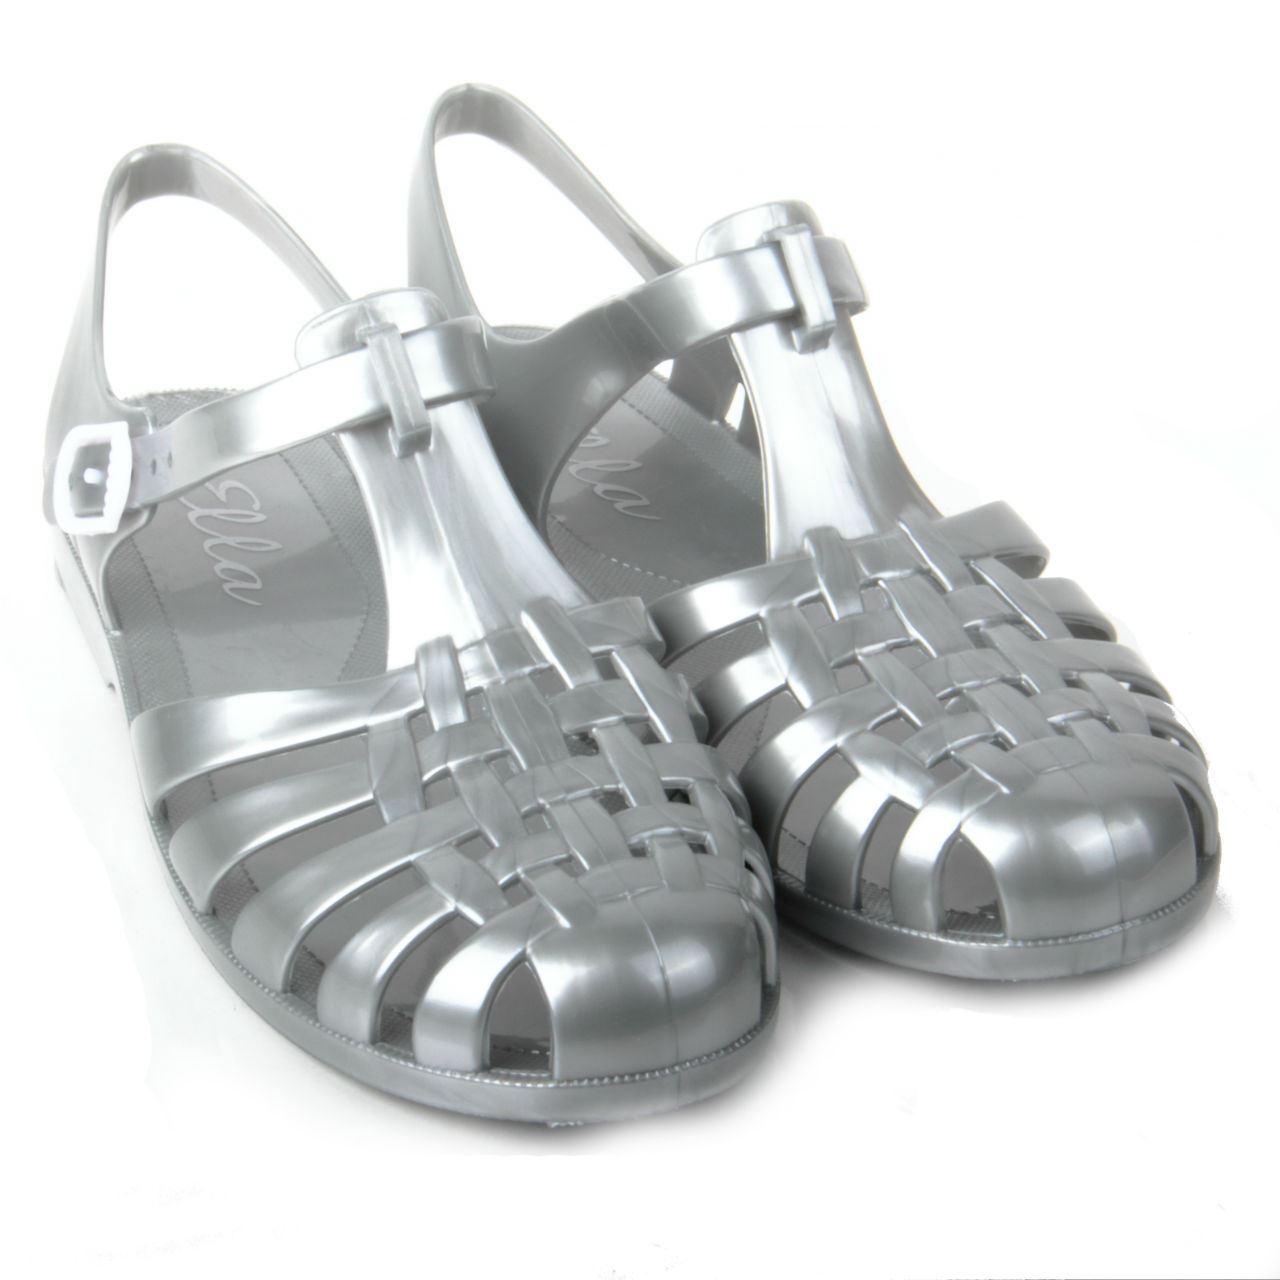 Black juju sandals - Womens Jellies Jelly Bean Flat Shoes Juju Summer